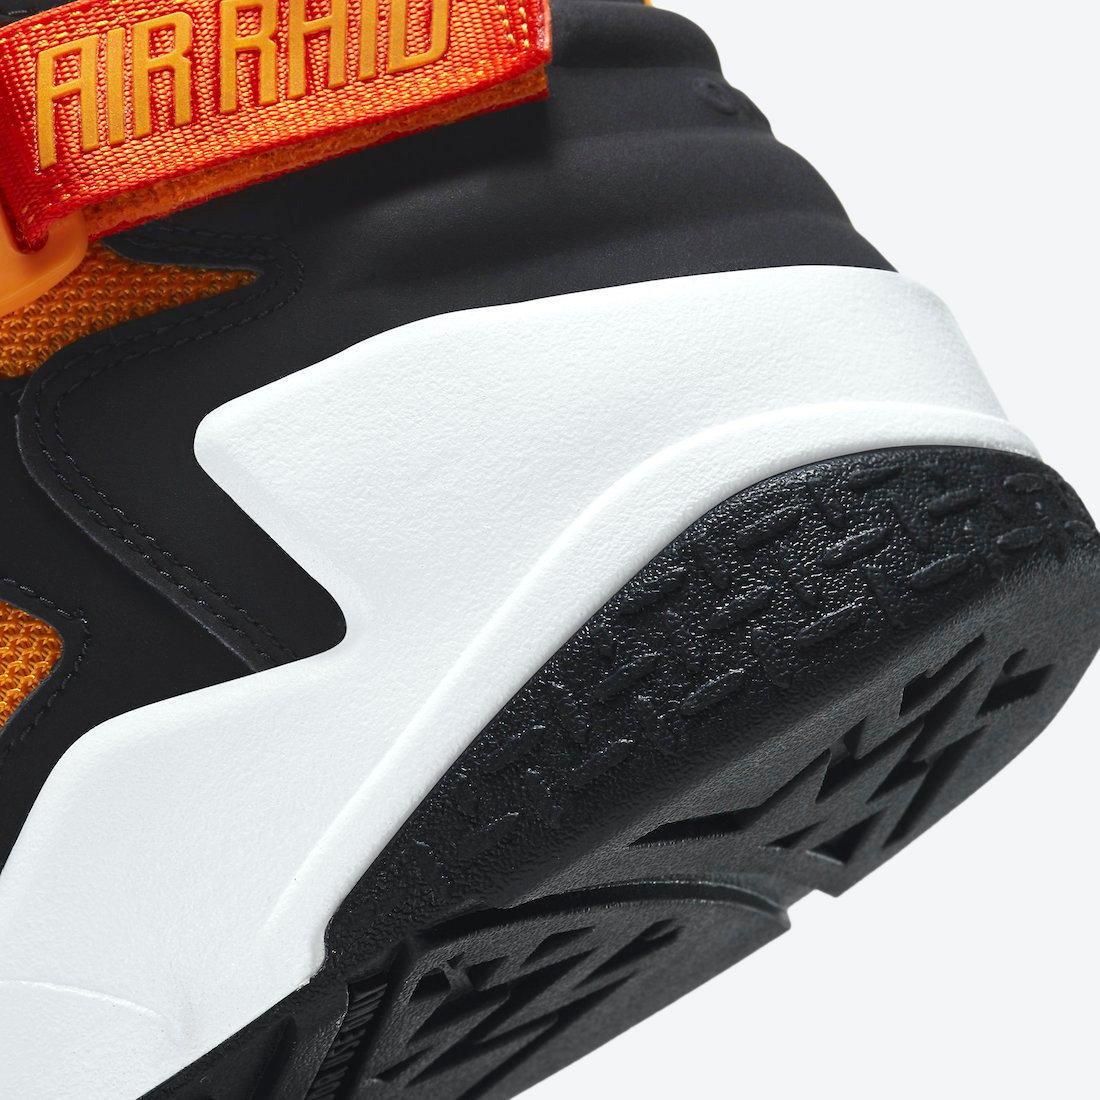 Nike Air Raid Rayguns DD9222-001 Release Date